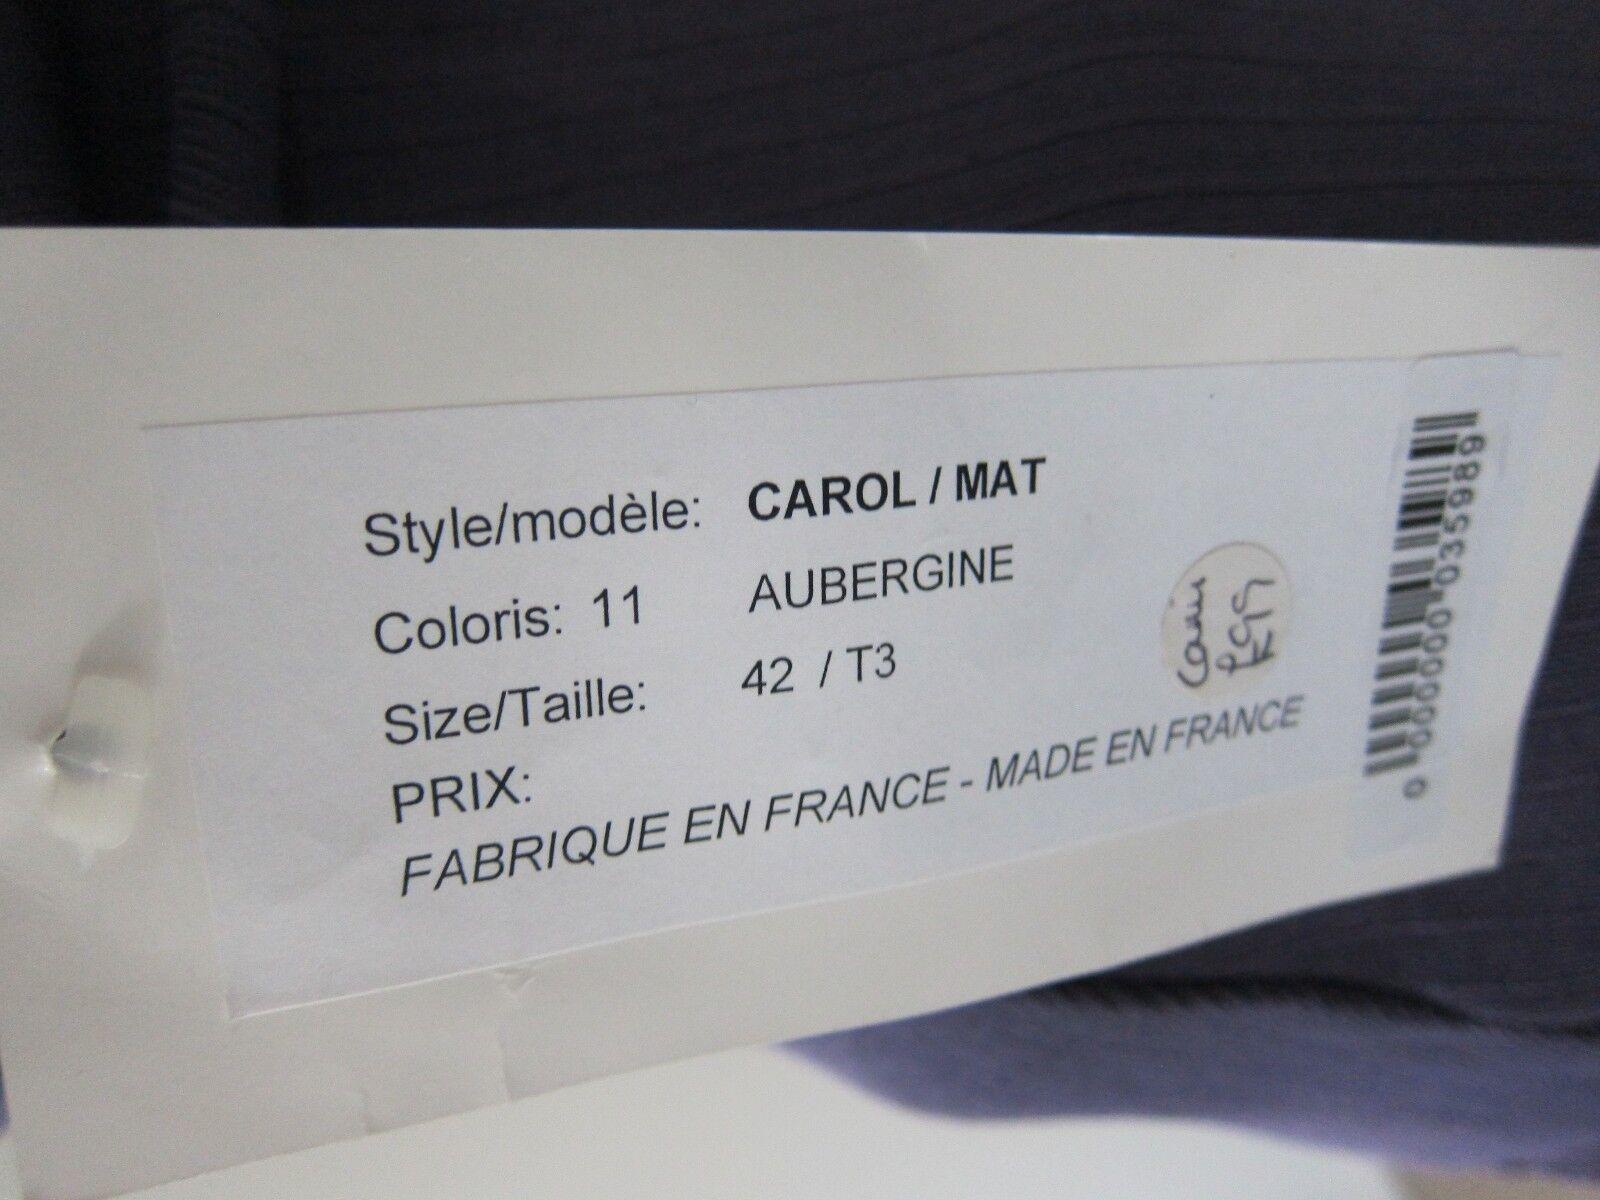 Lil POUR L'AUTRE manica lunga Cardigan & corrispondenza Canottiera Top Top Top colore melanzana taglia 14 b1ca8f